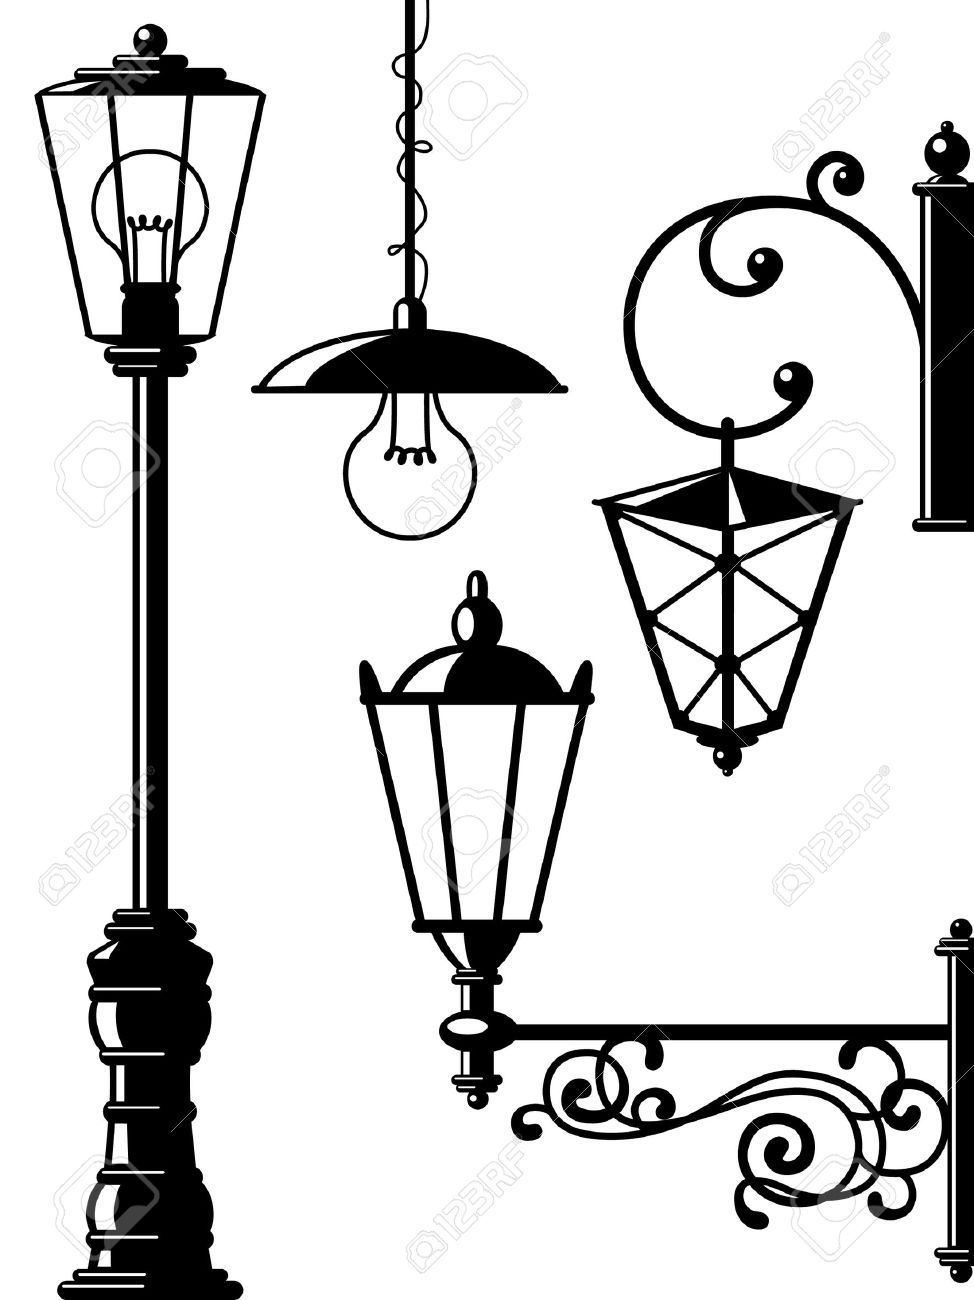 Silhouettes Of Retro Lanterns Street Lamps Street Lamp Lantern Drawing Simple Wall Paintings